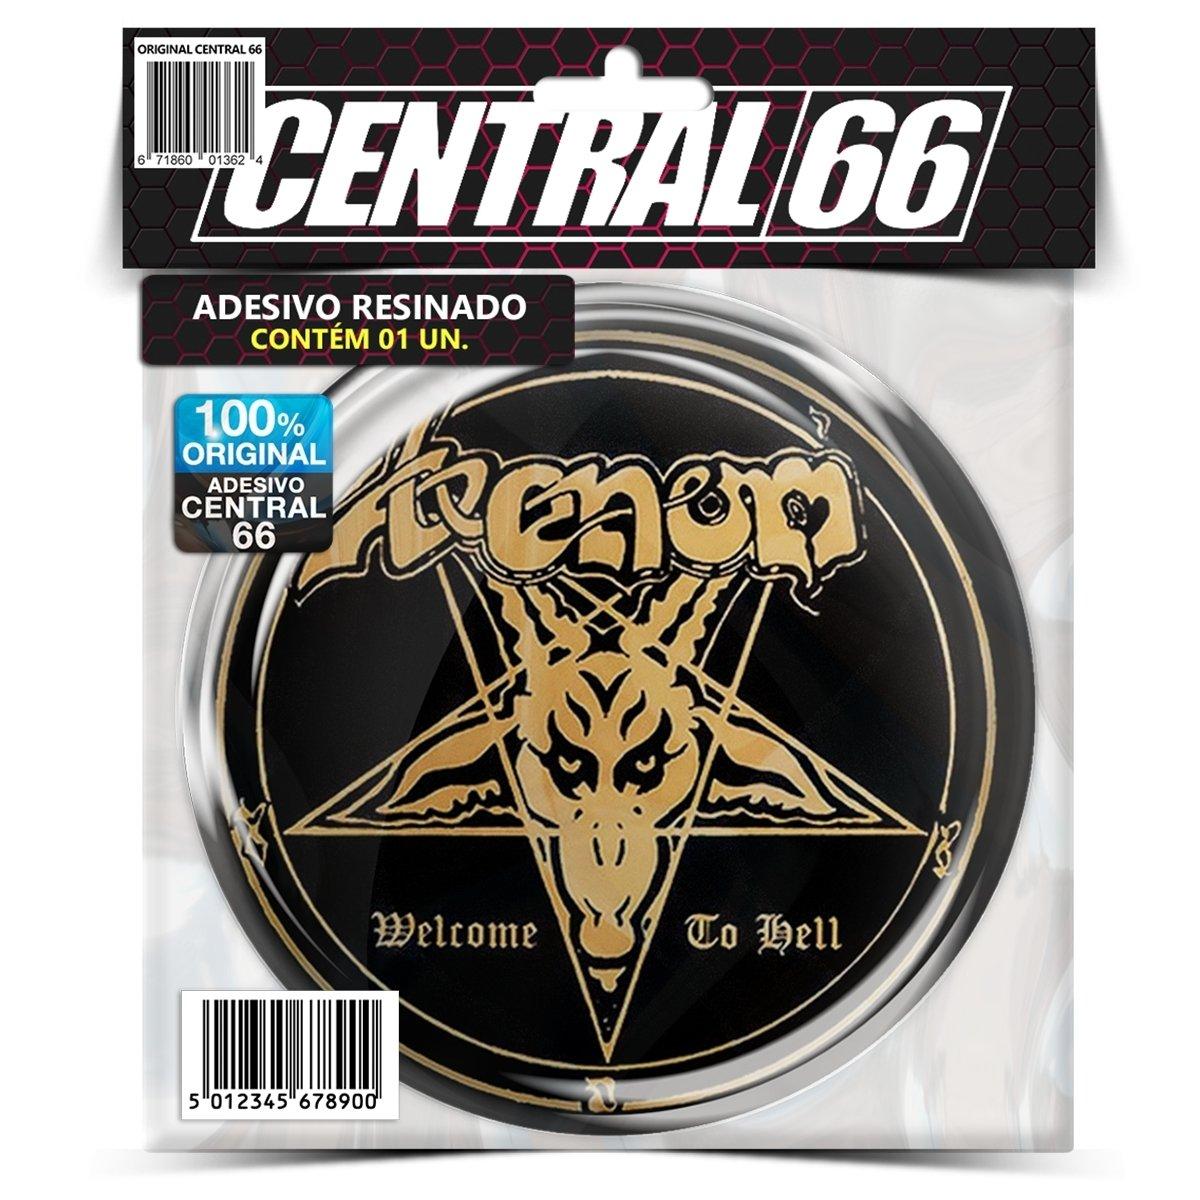 Adesivo Redondo Venom Welcome to Hell Pentagrama – Central 66